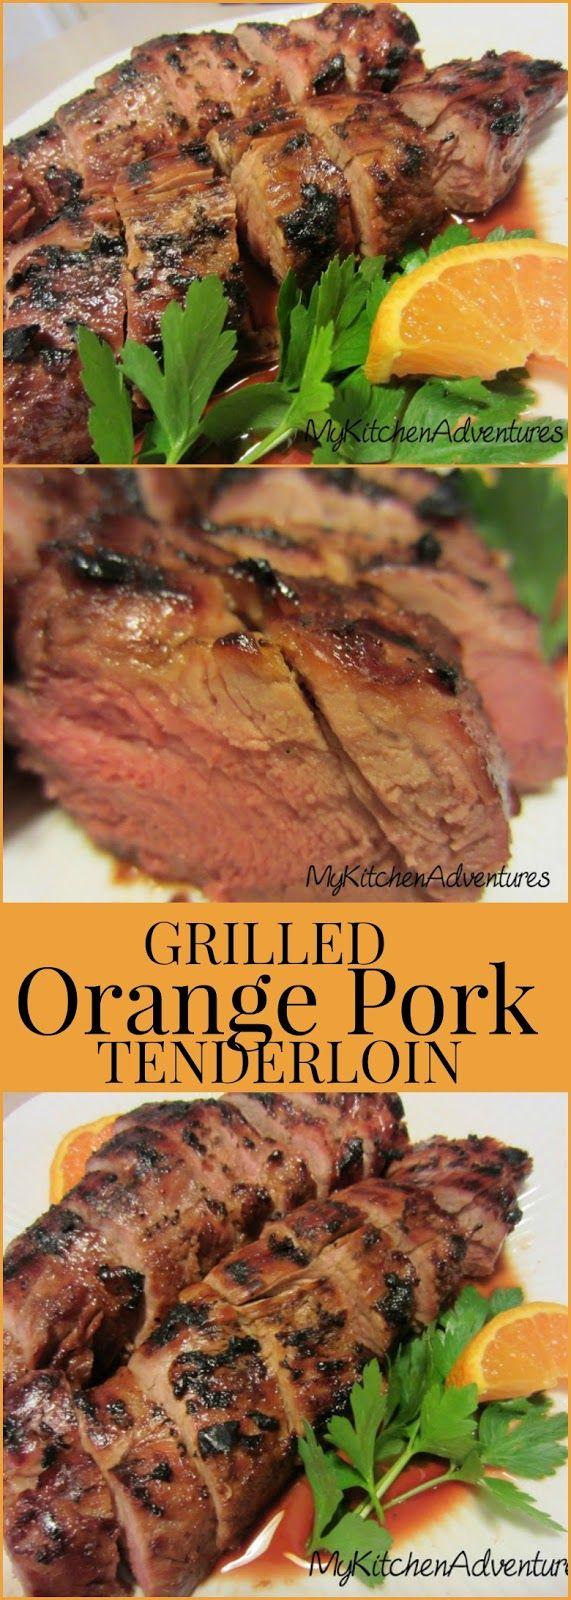 Grilled Orange Pork Tenderloin